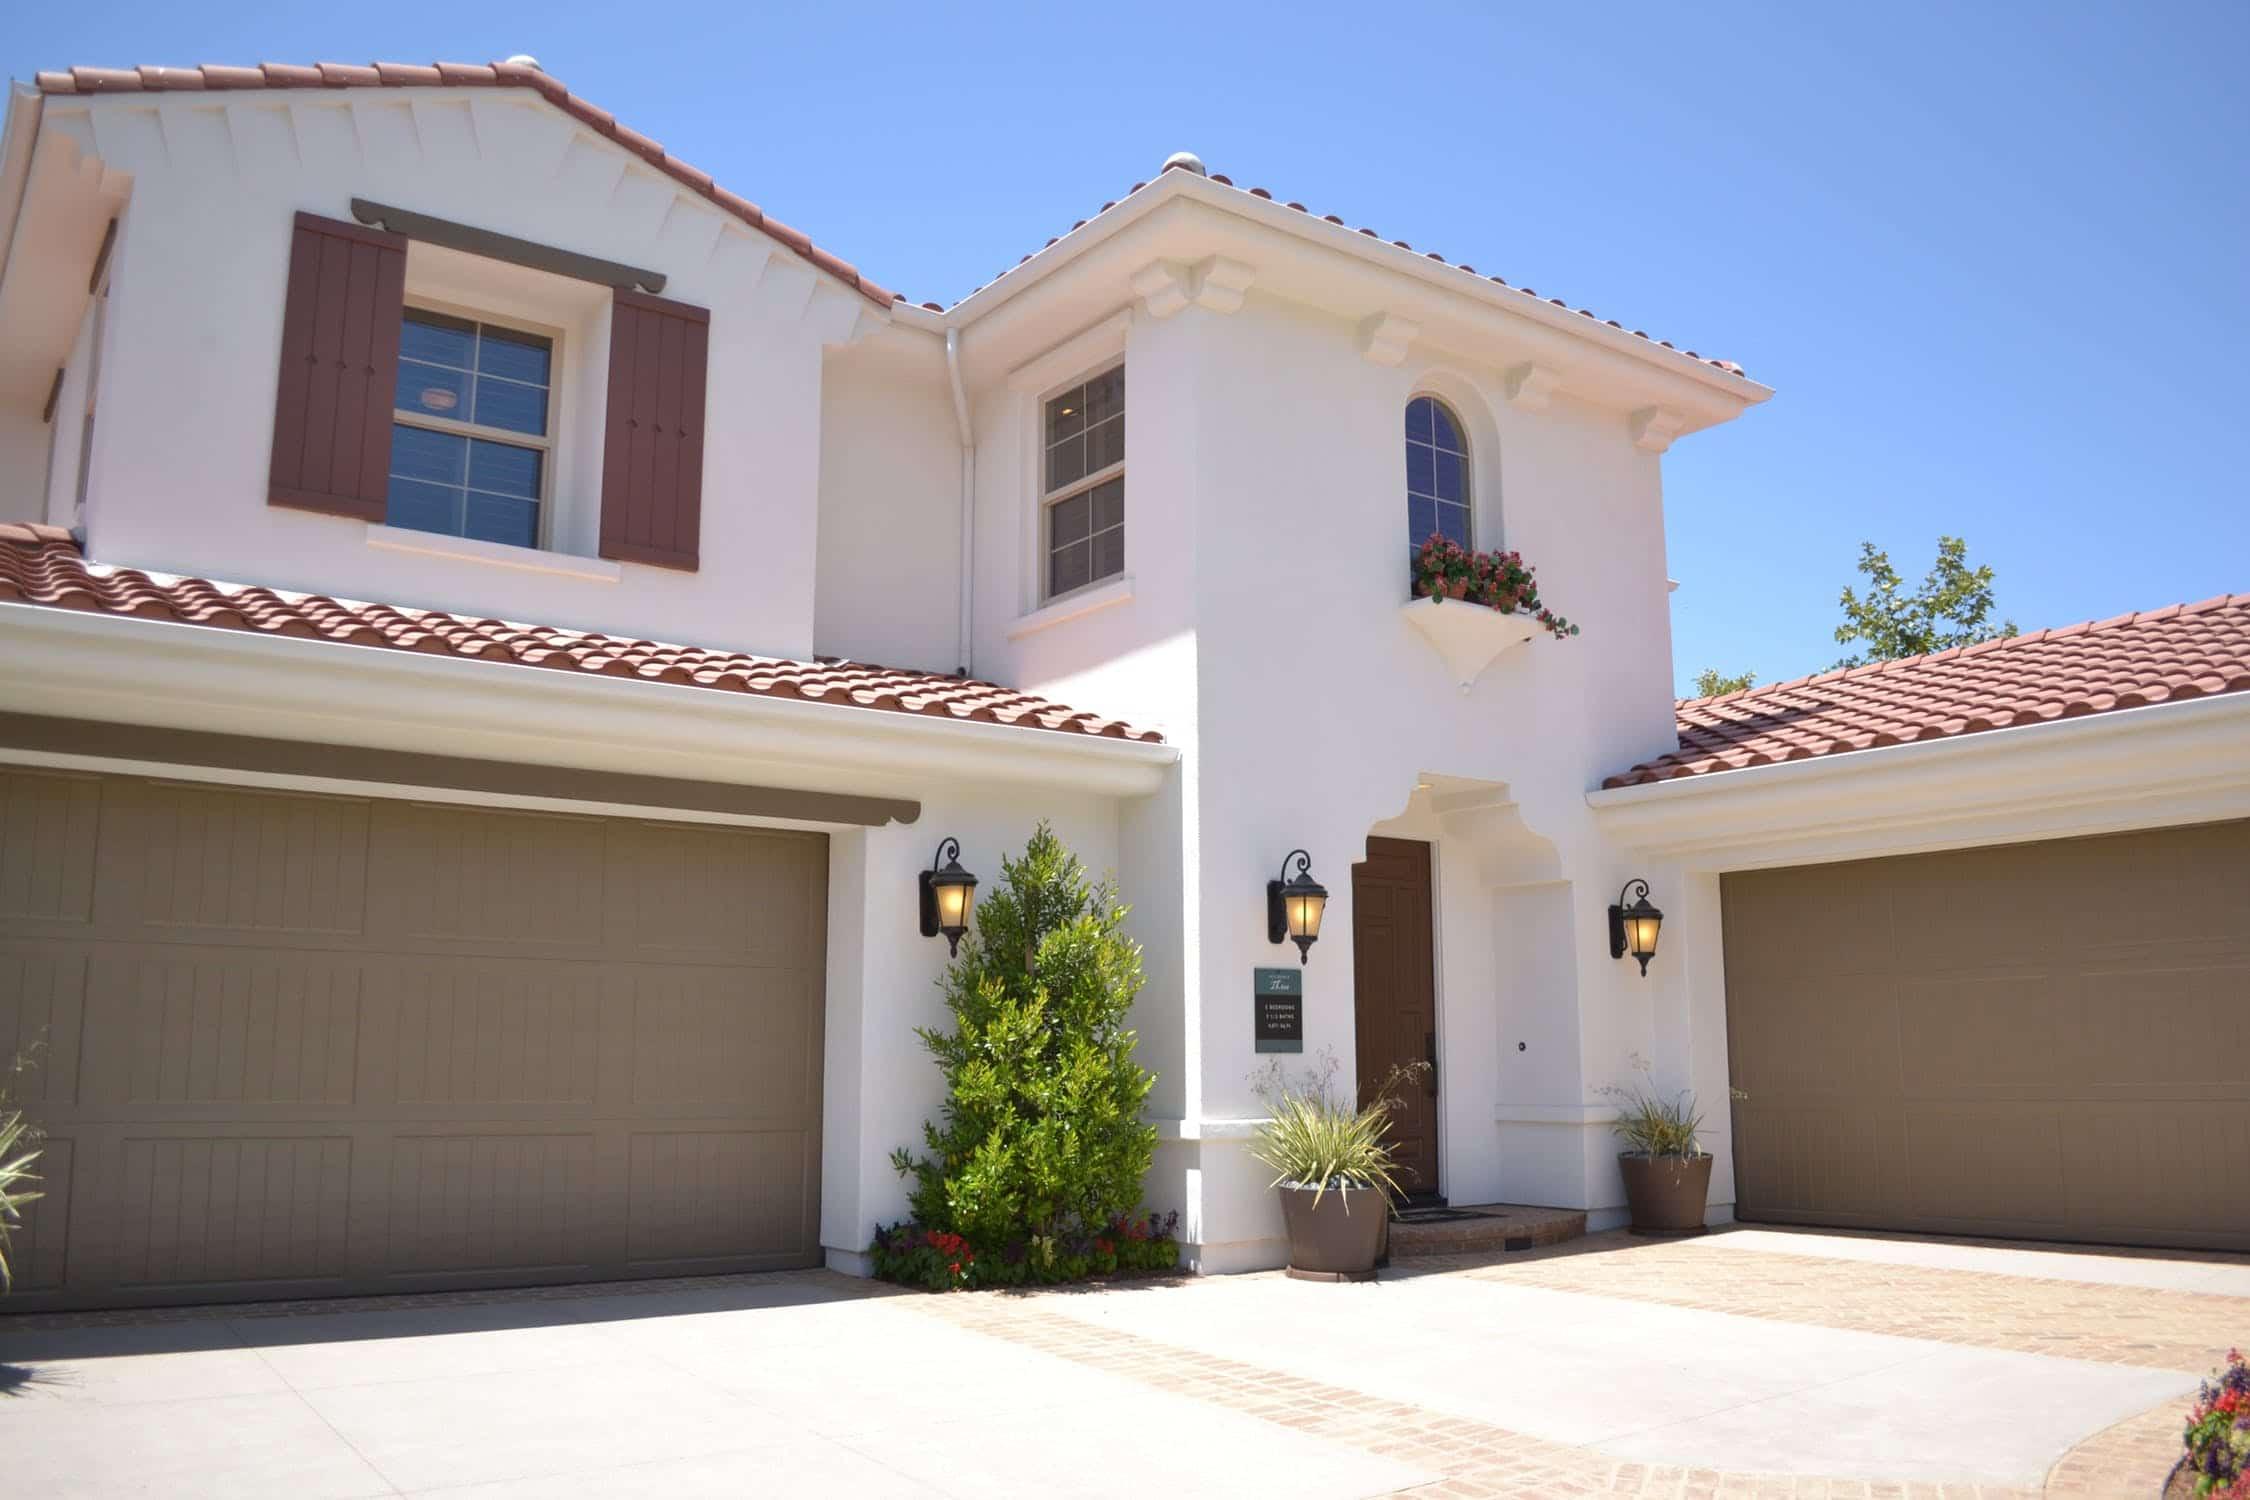 Spanish home in California